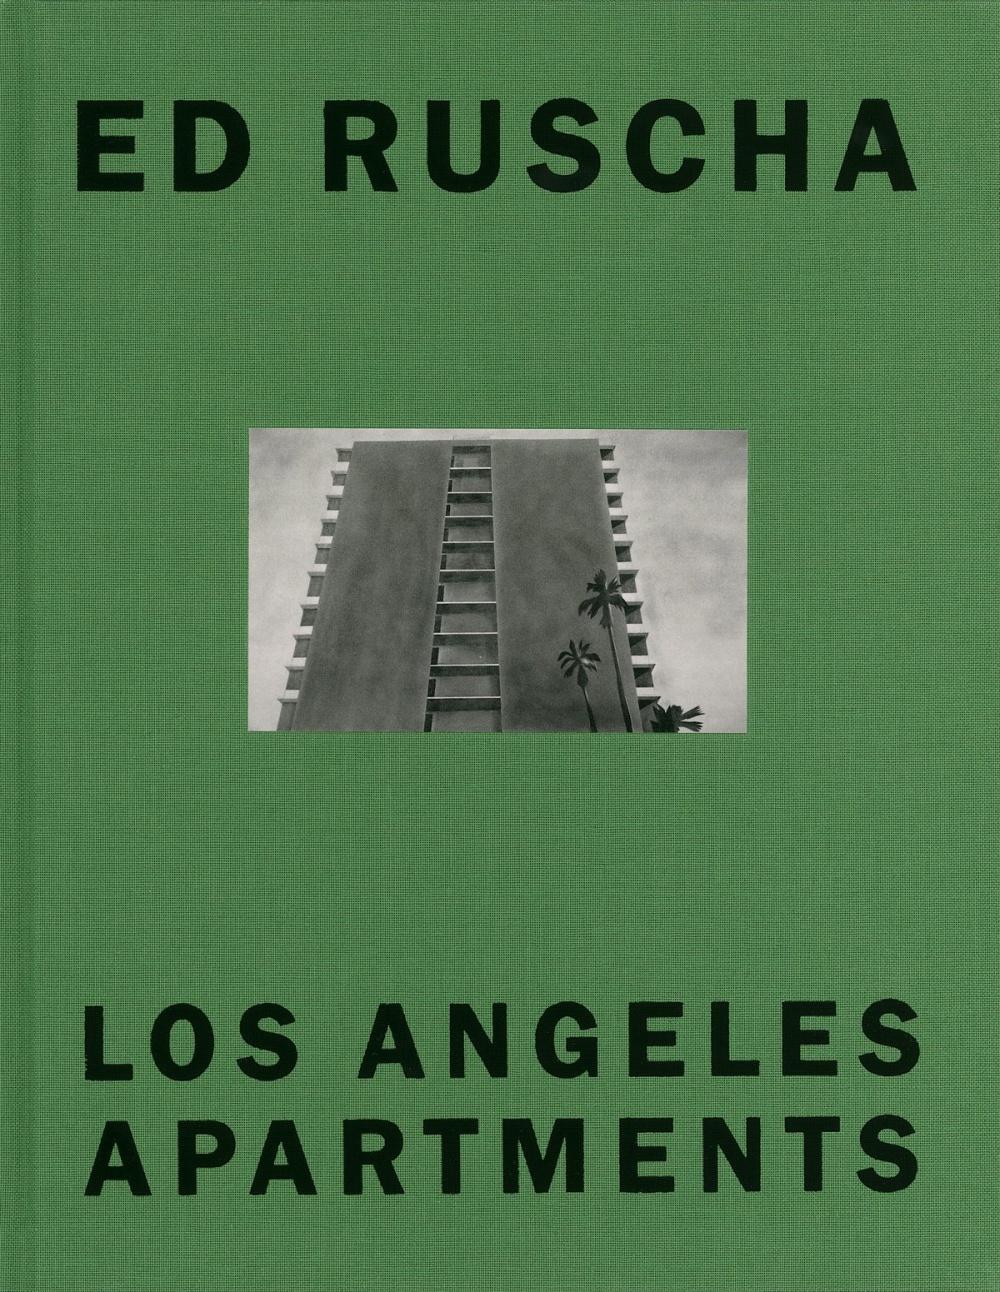 ruscha apartments